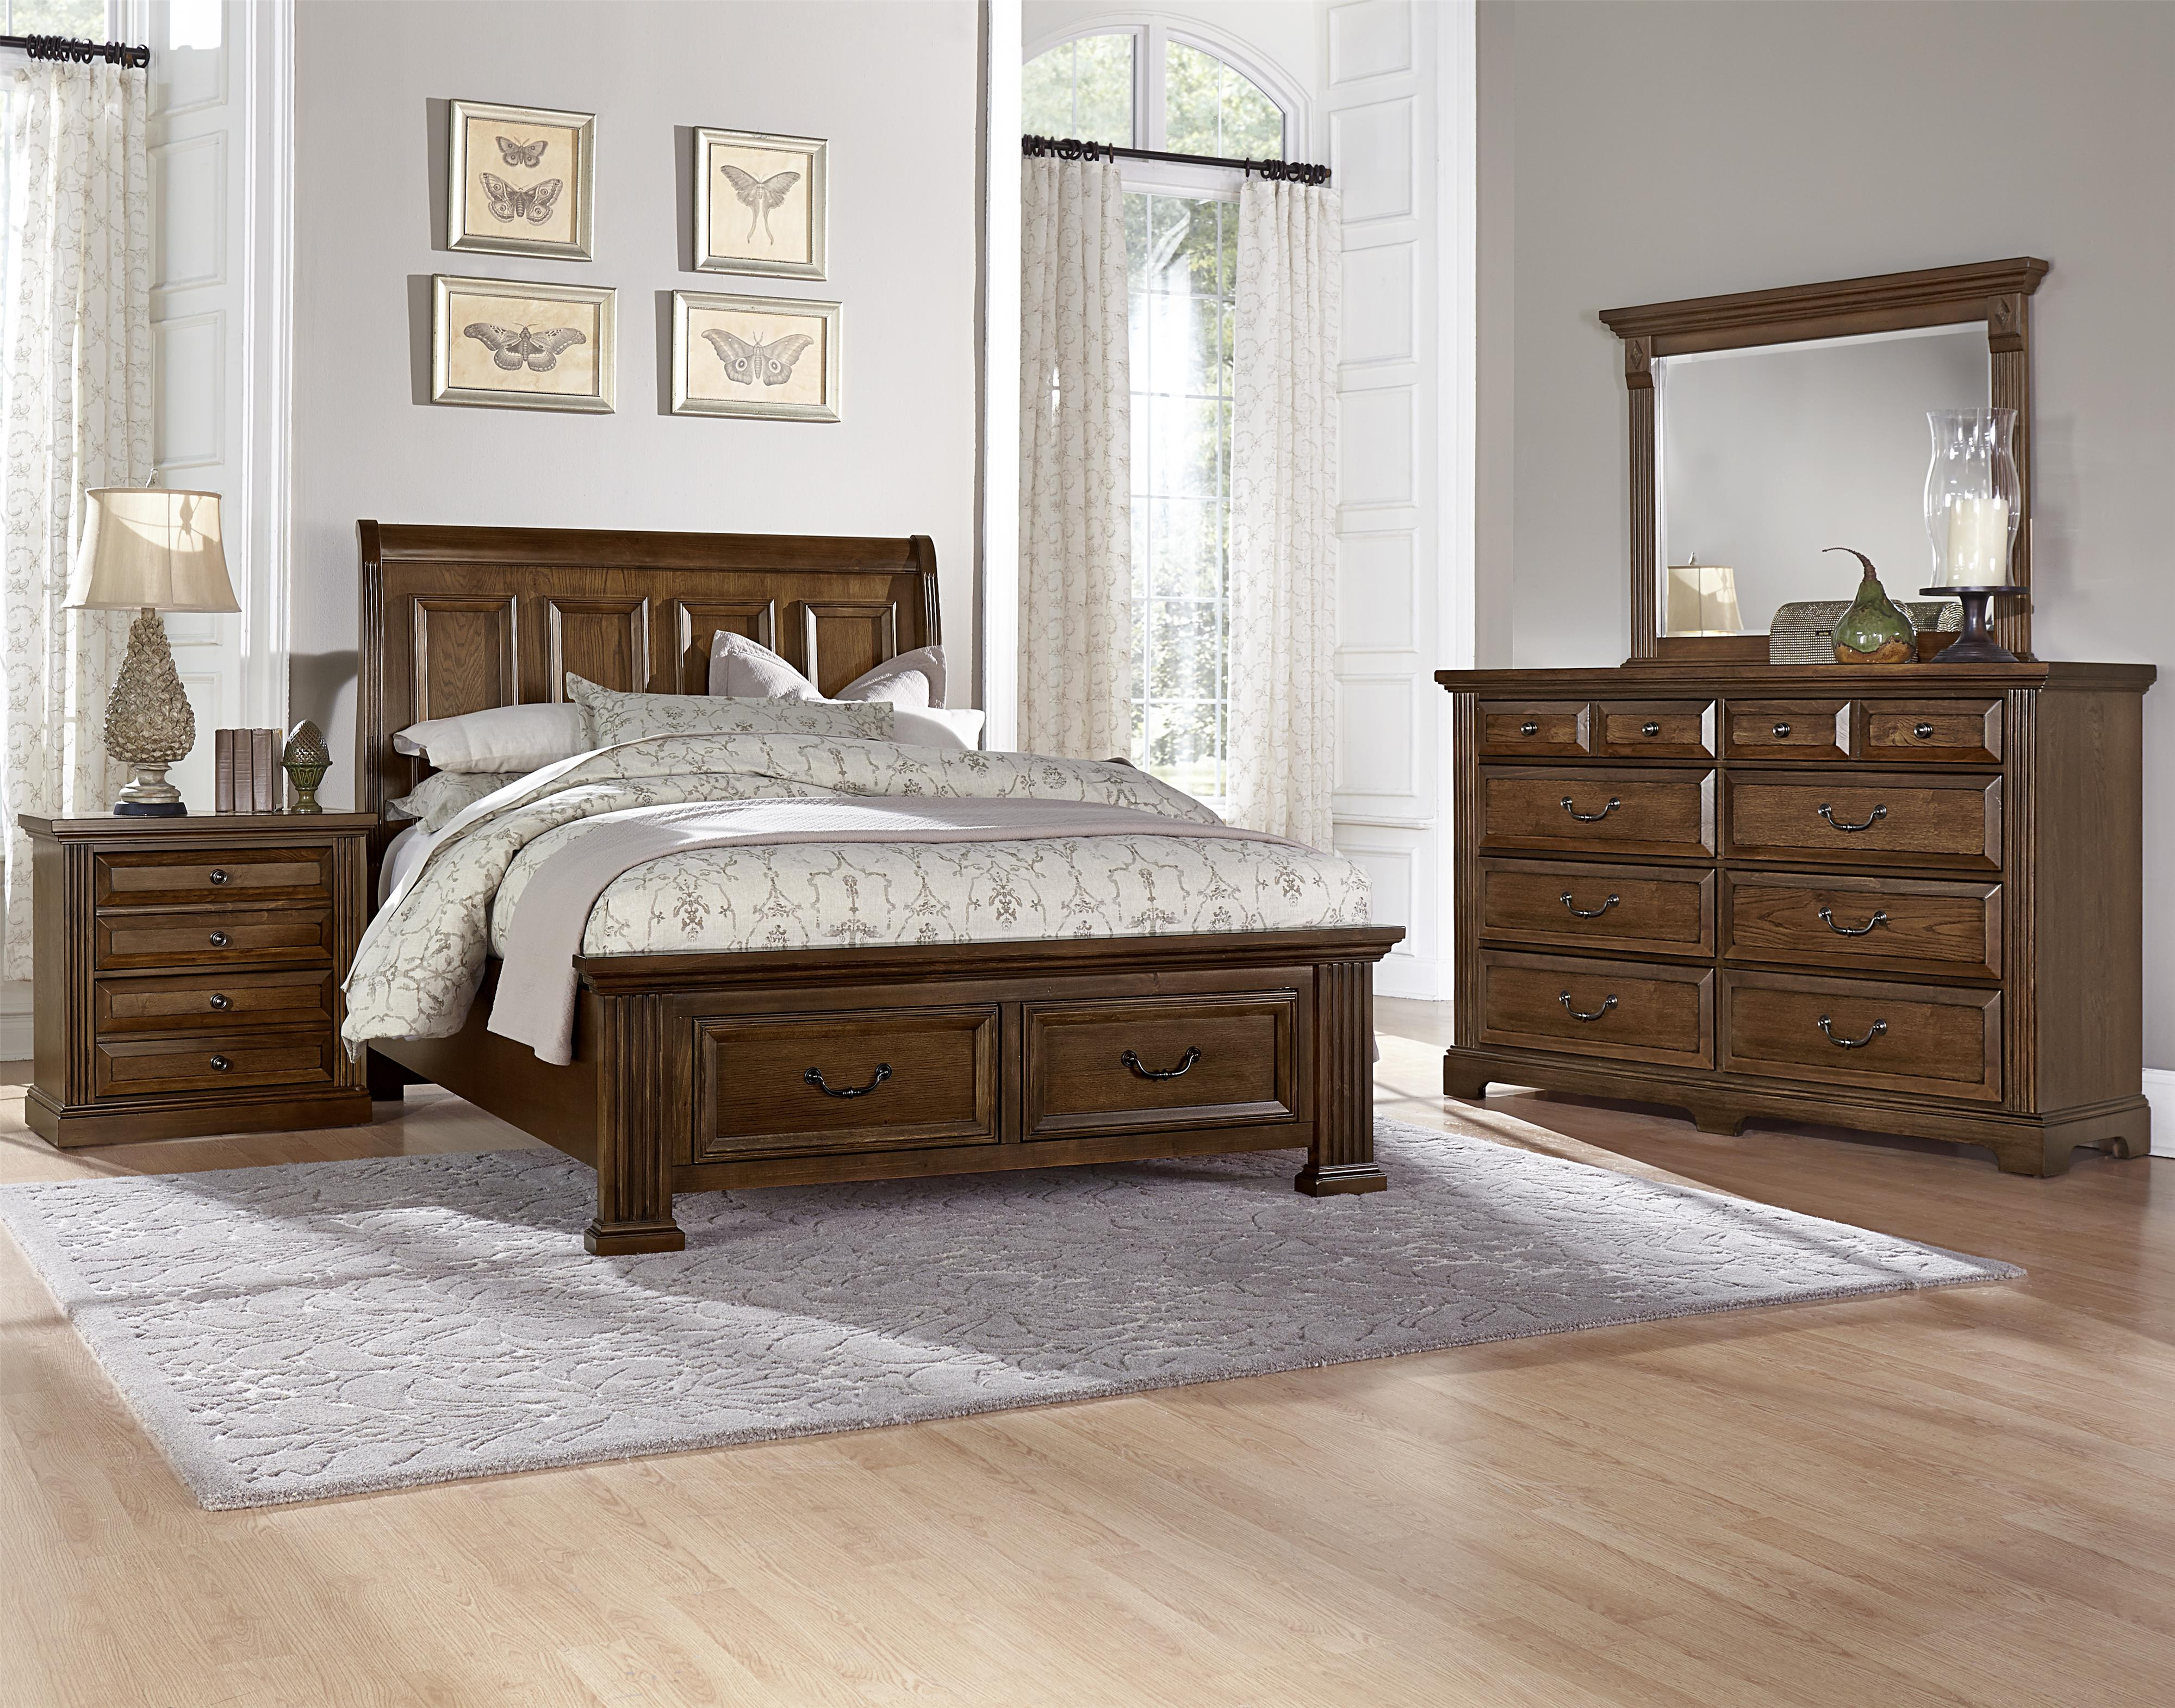 Vaughan Bassett Woodlands King Bedroom Group - Item Number: BB97 K Bedroom Group 3